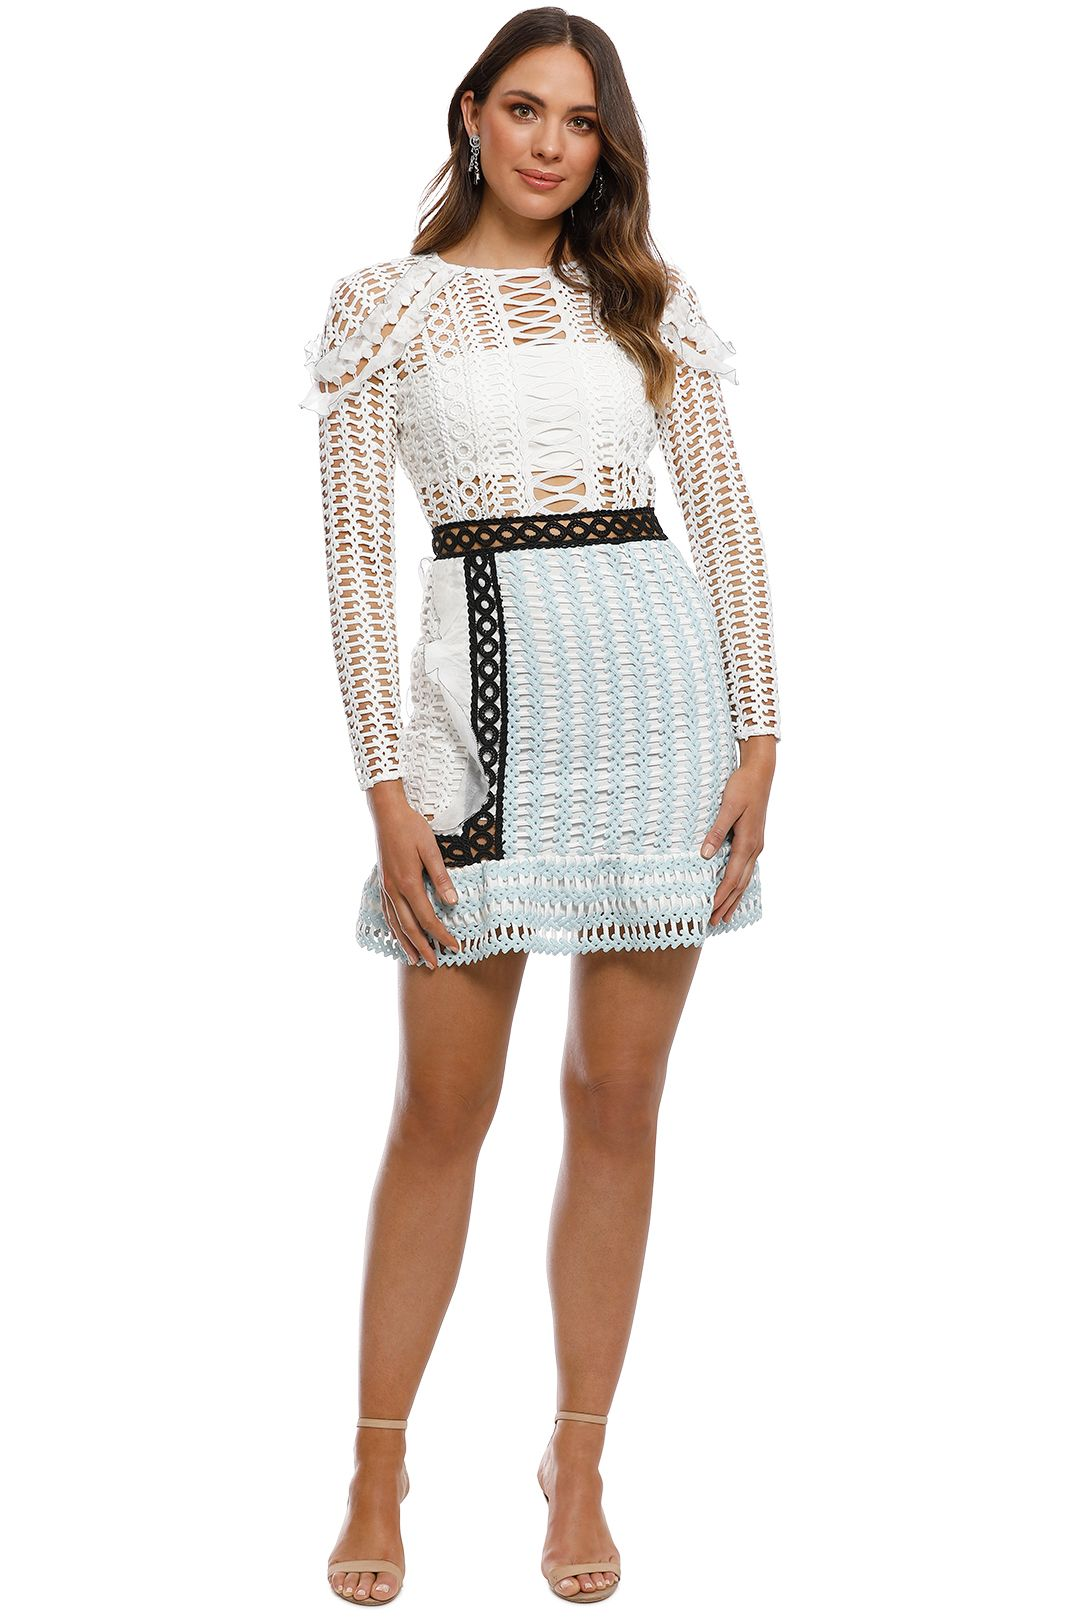 Self Portrait - Frill Shoulder Panel Dress - White Blue - Front